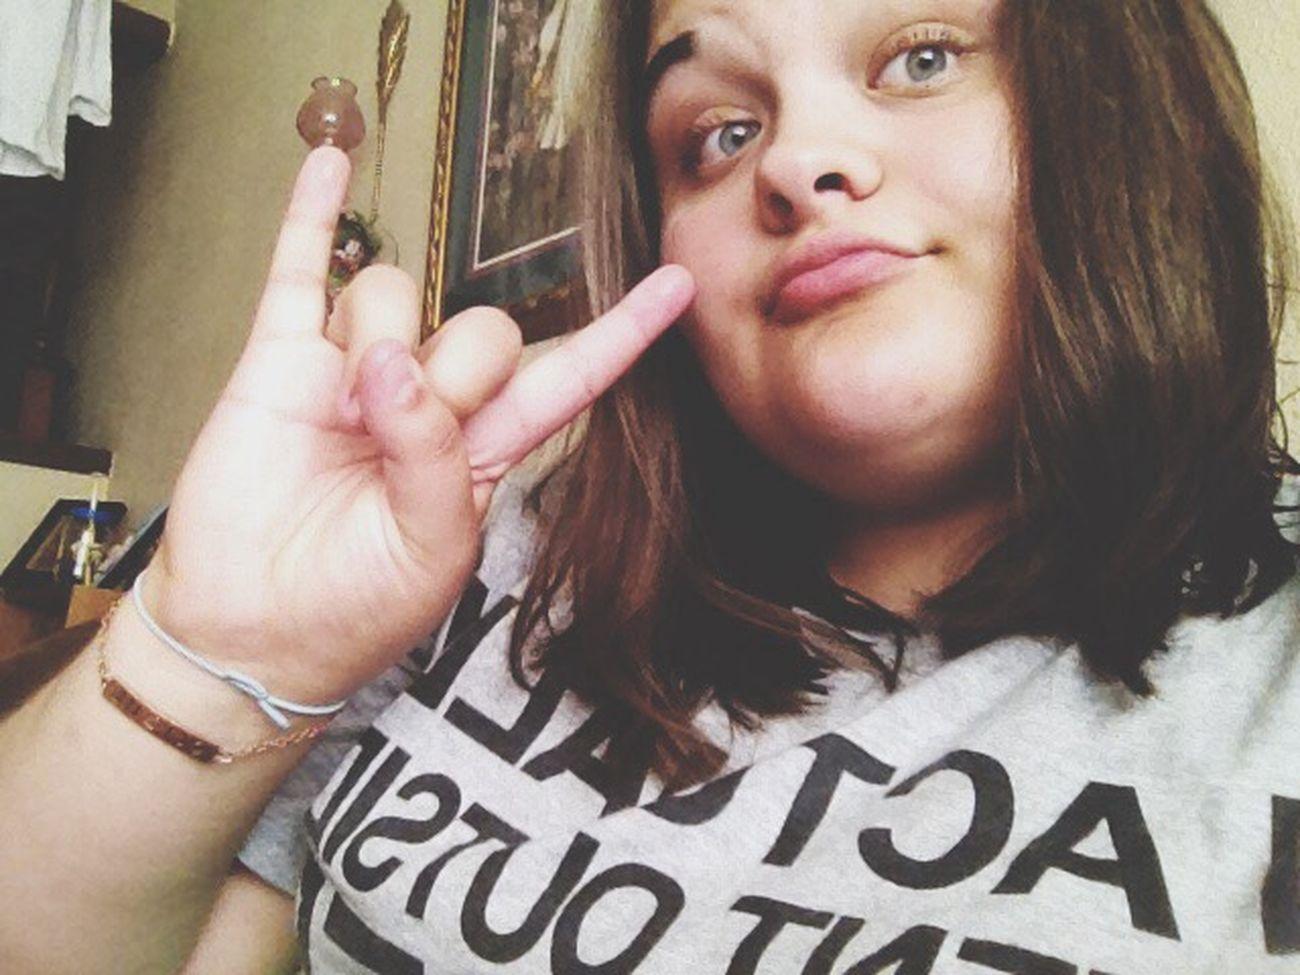 🤘rockin out🤘 Hello World Enjoying Life ♥ Summer ☀ Peace ✌ ROCK ON! Rock Out BestofEyeEm Living Life EyeEm Best Shots Hello Internet Hello Lovelies Hi Loner Life Be Unique